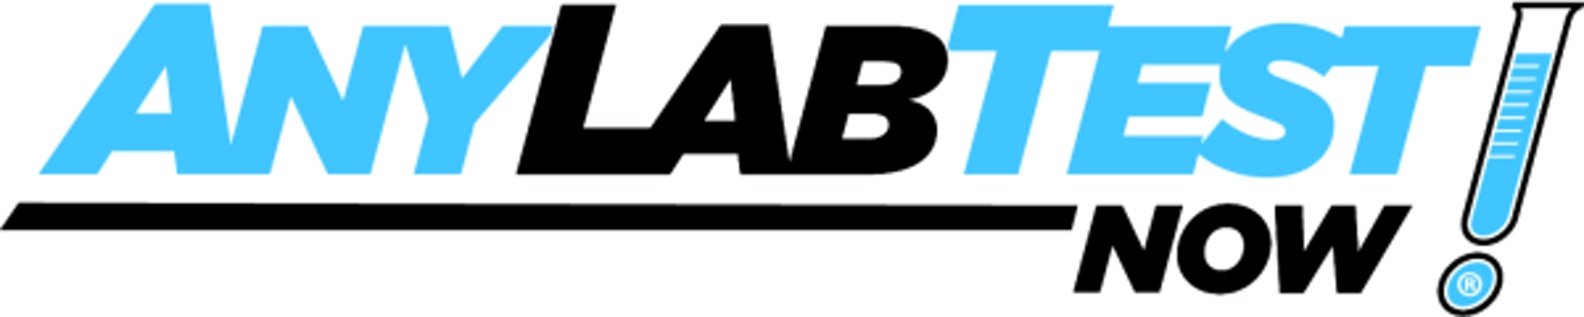 Any Lab Test Now - Royal Oaks Logo